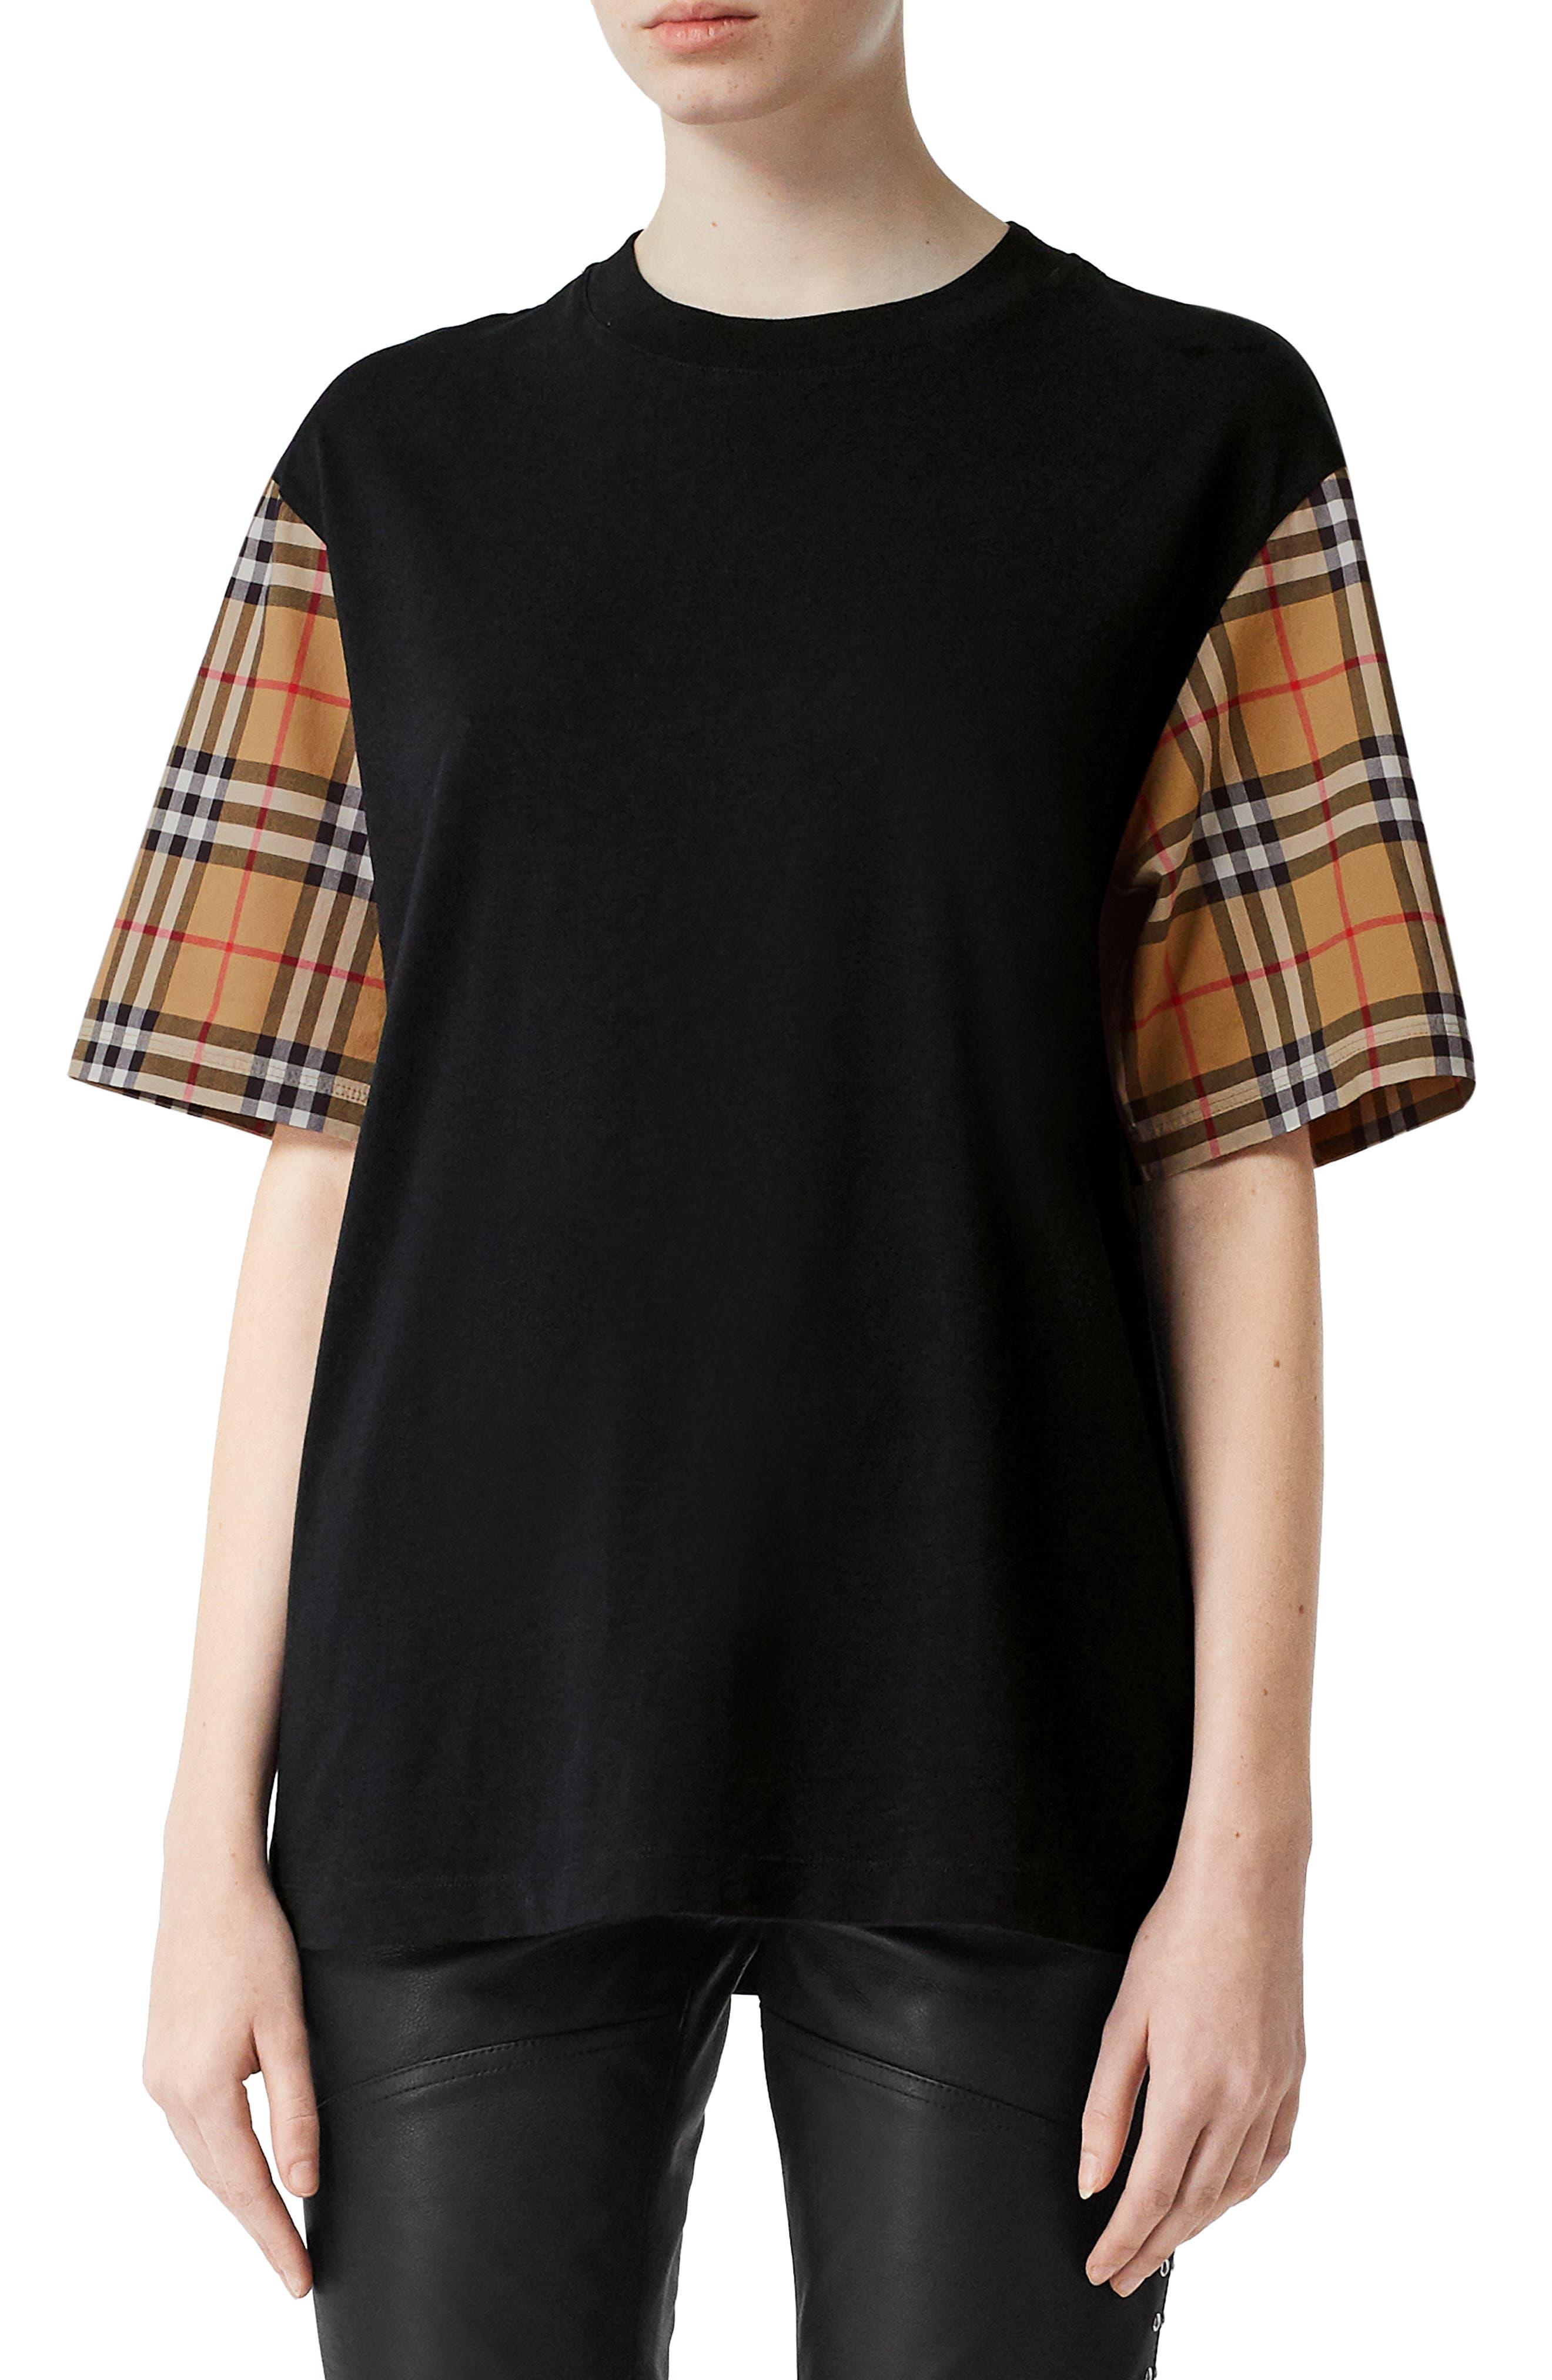 FREE POSTAGE NEW Black Rabbit Women/'s T-shirt UK 16